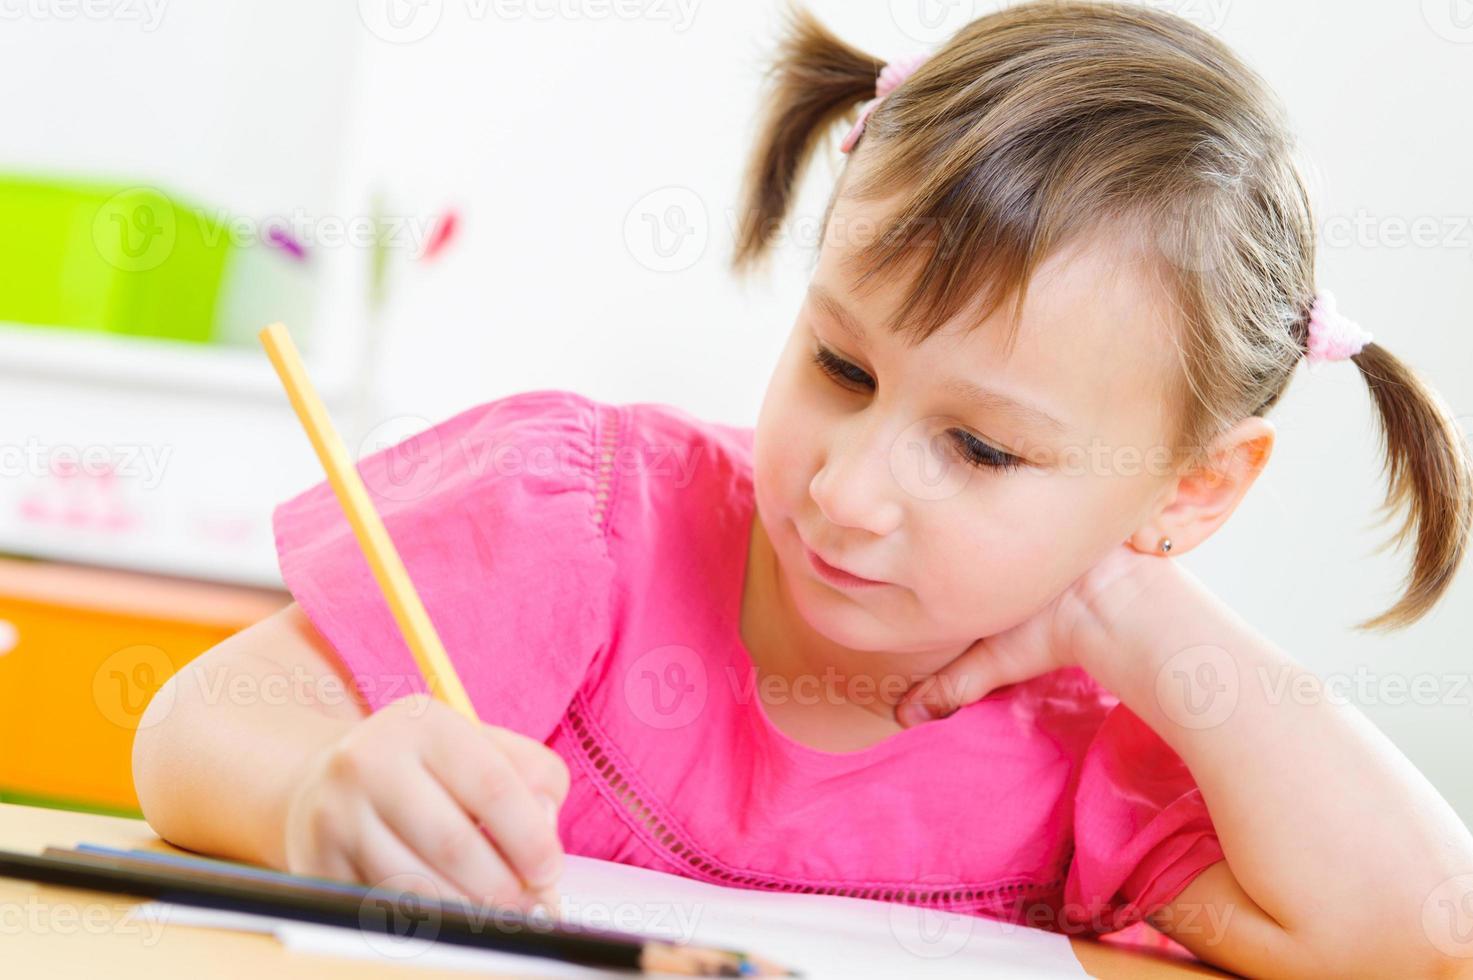 linda niña estudio en casa foto